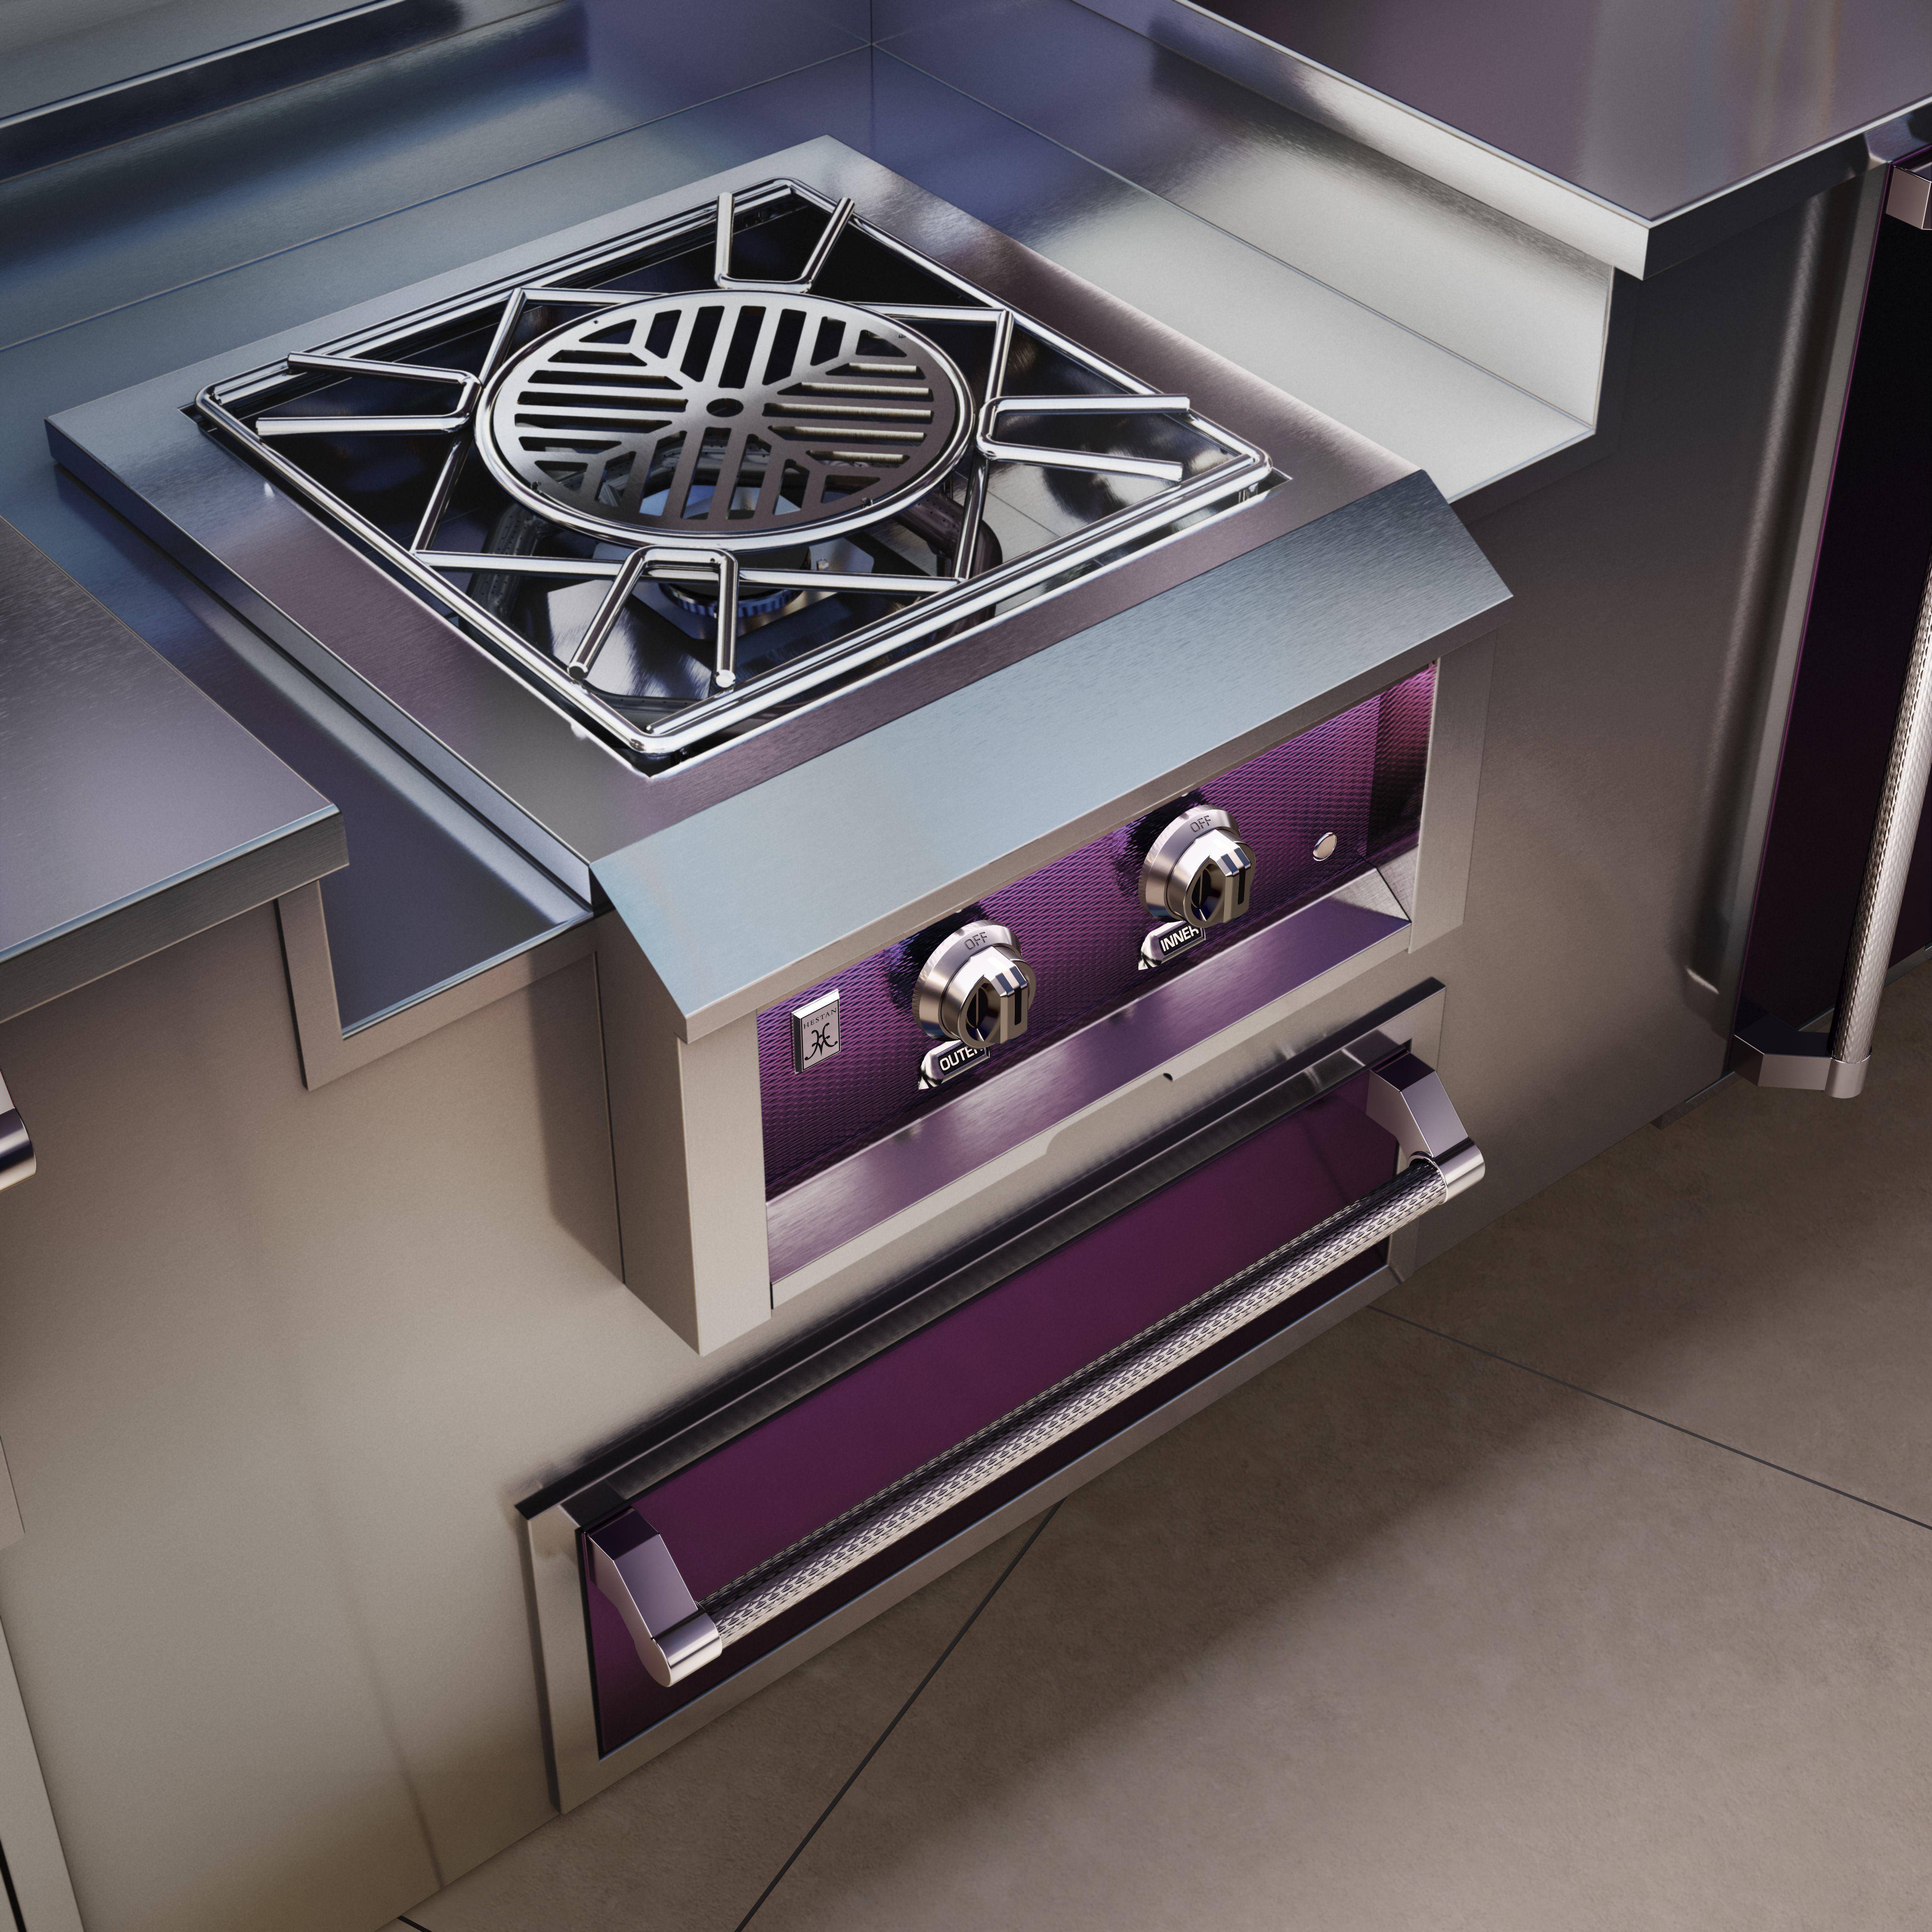 24 Outdoor Power Burner Stainless Steel Side Burner Hestan In 2021 Installing Cabinets Storage Drawers Outdoor Kitchen Island